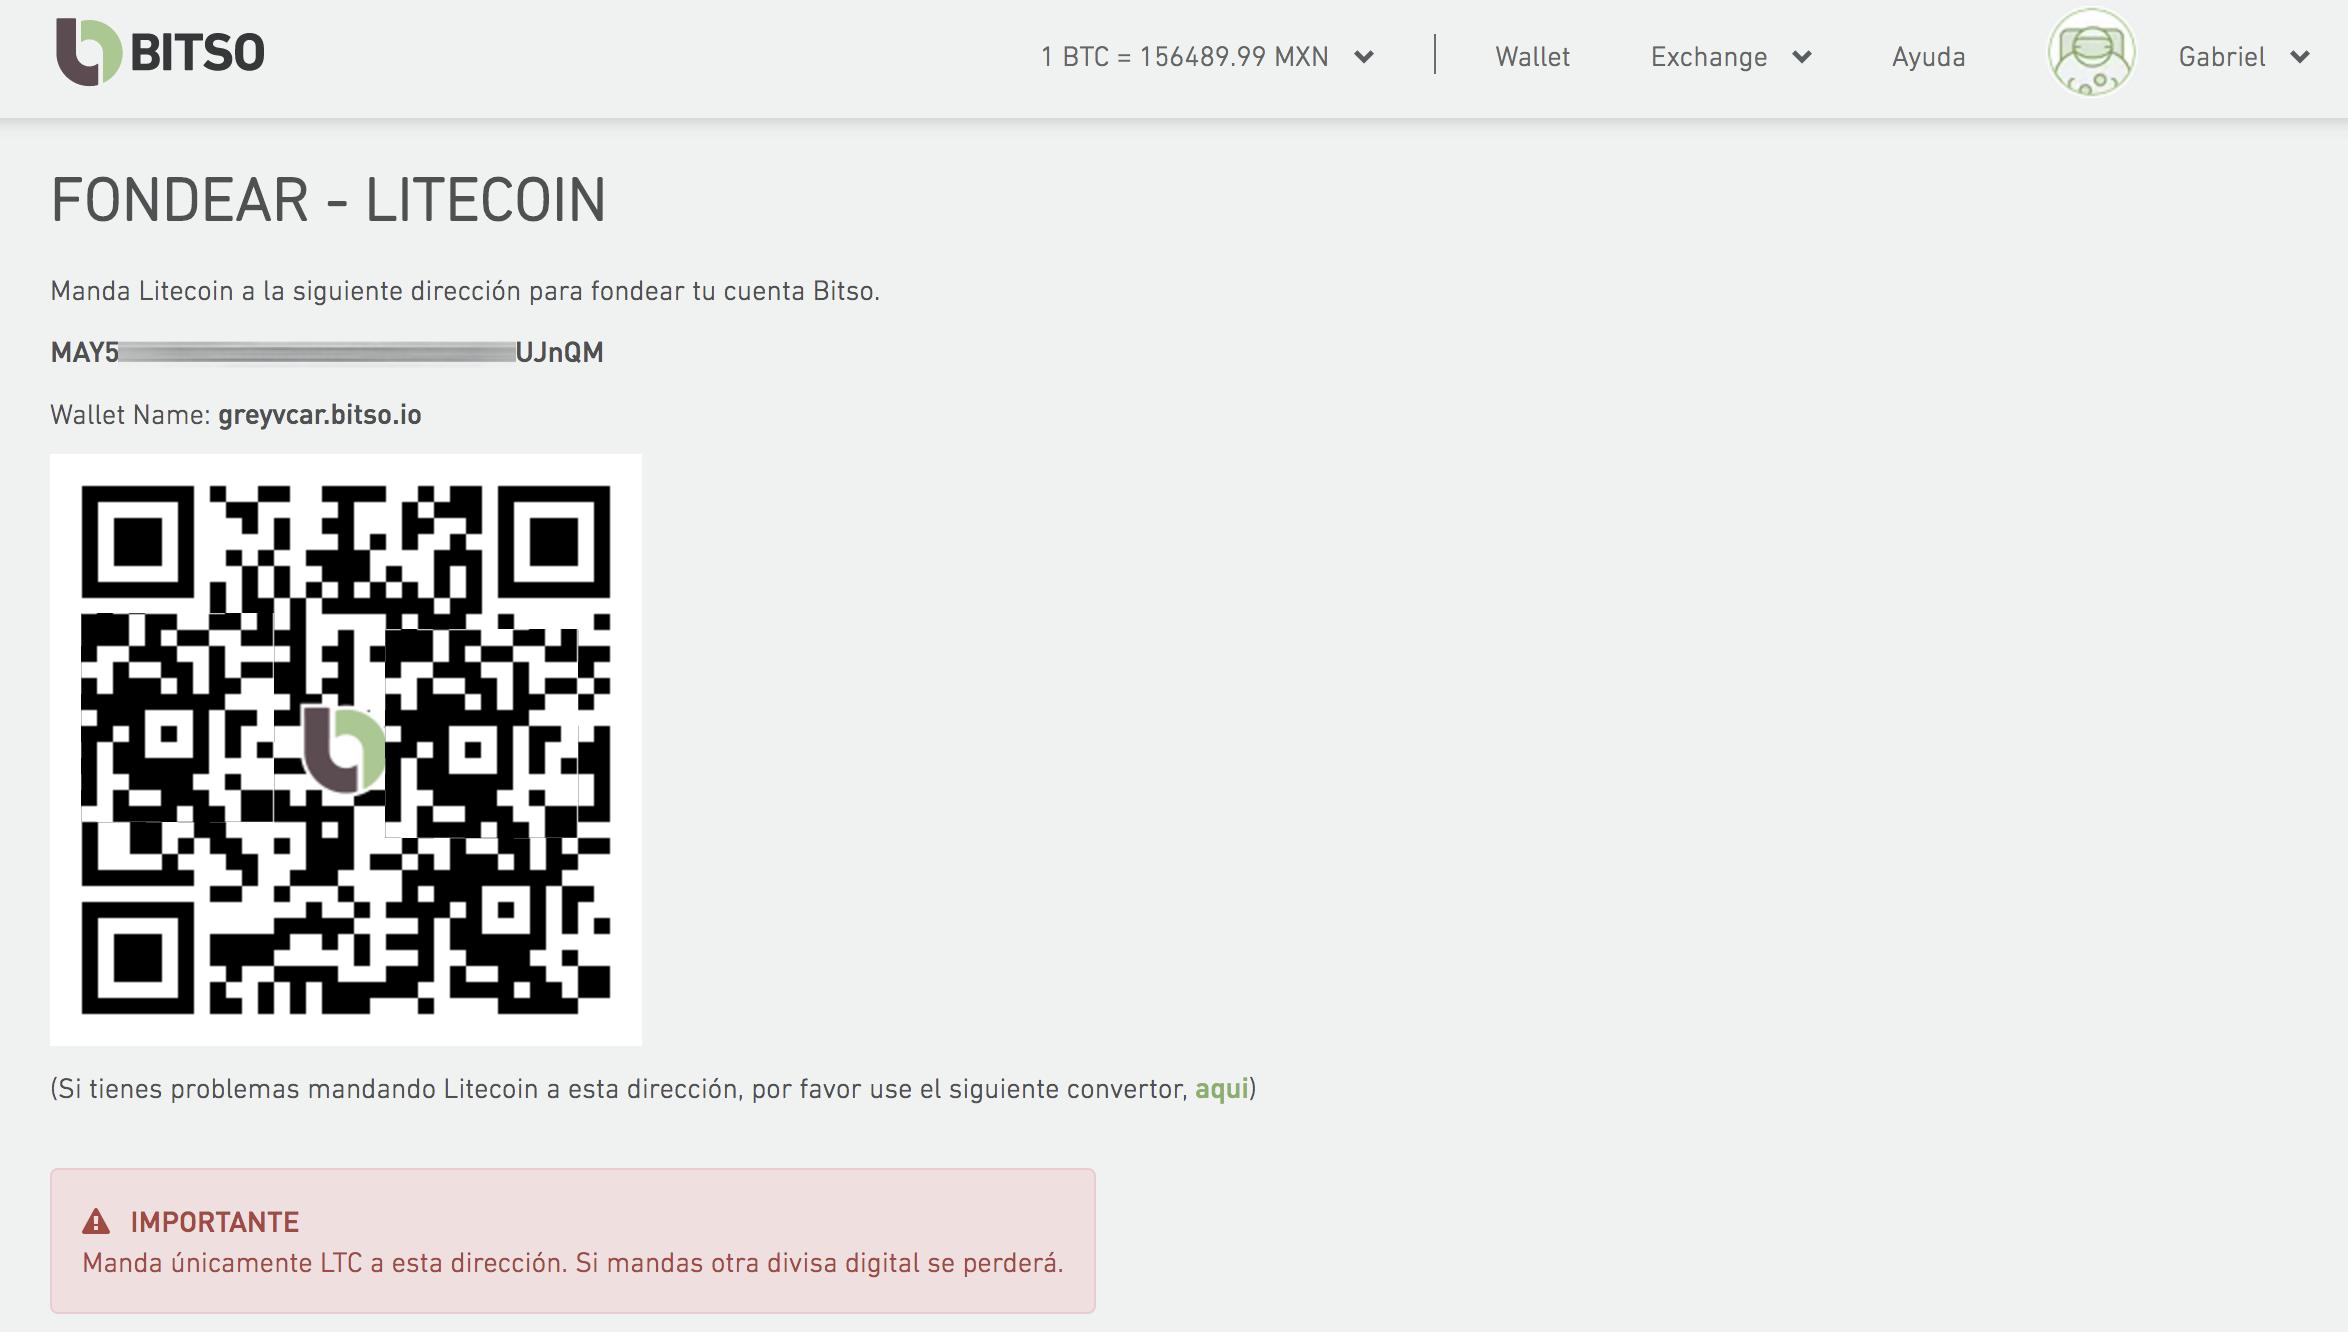 Gigahash to bitcoins bettinger realty chittenango ny zip code